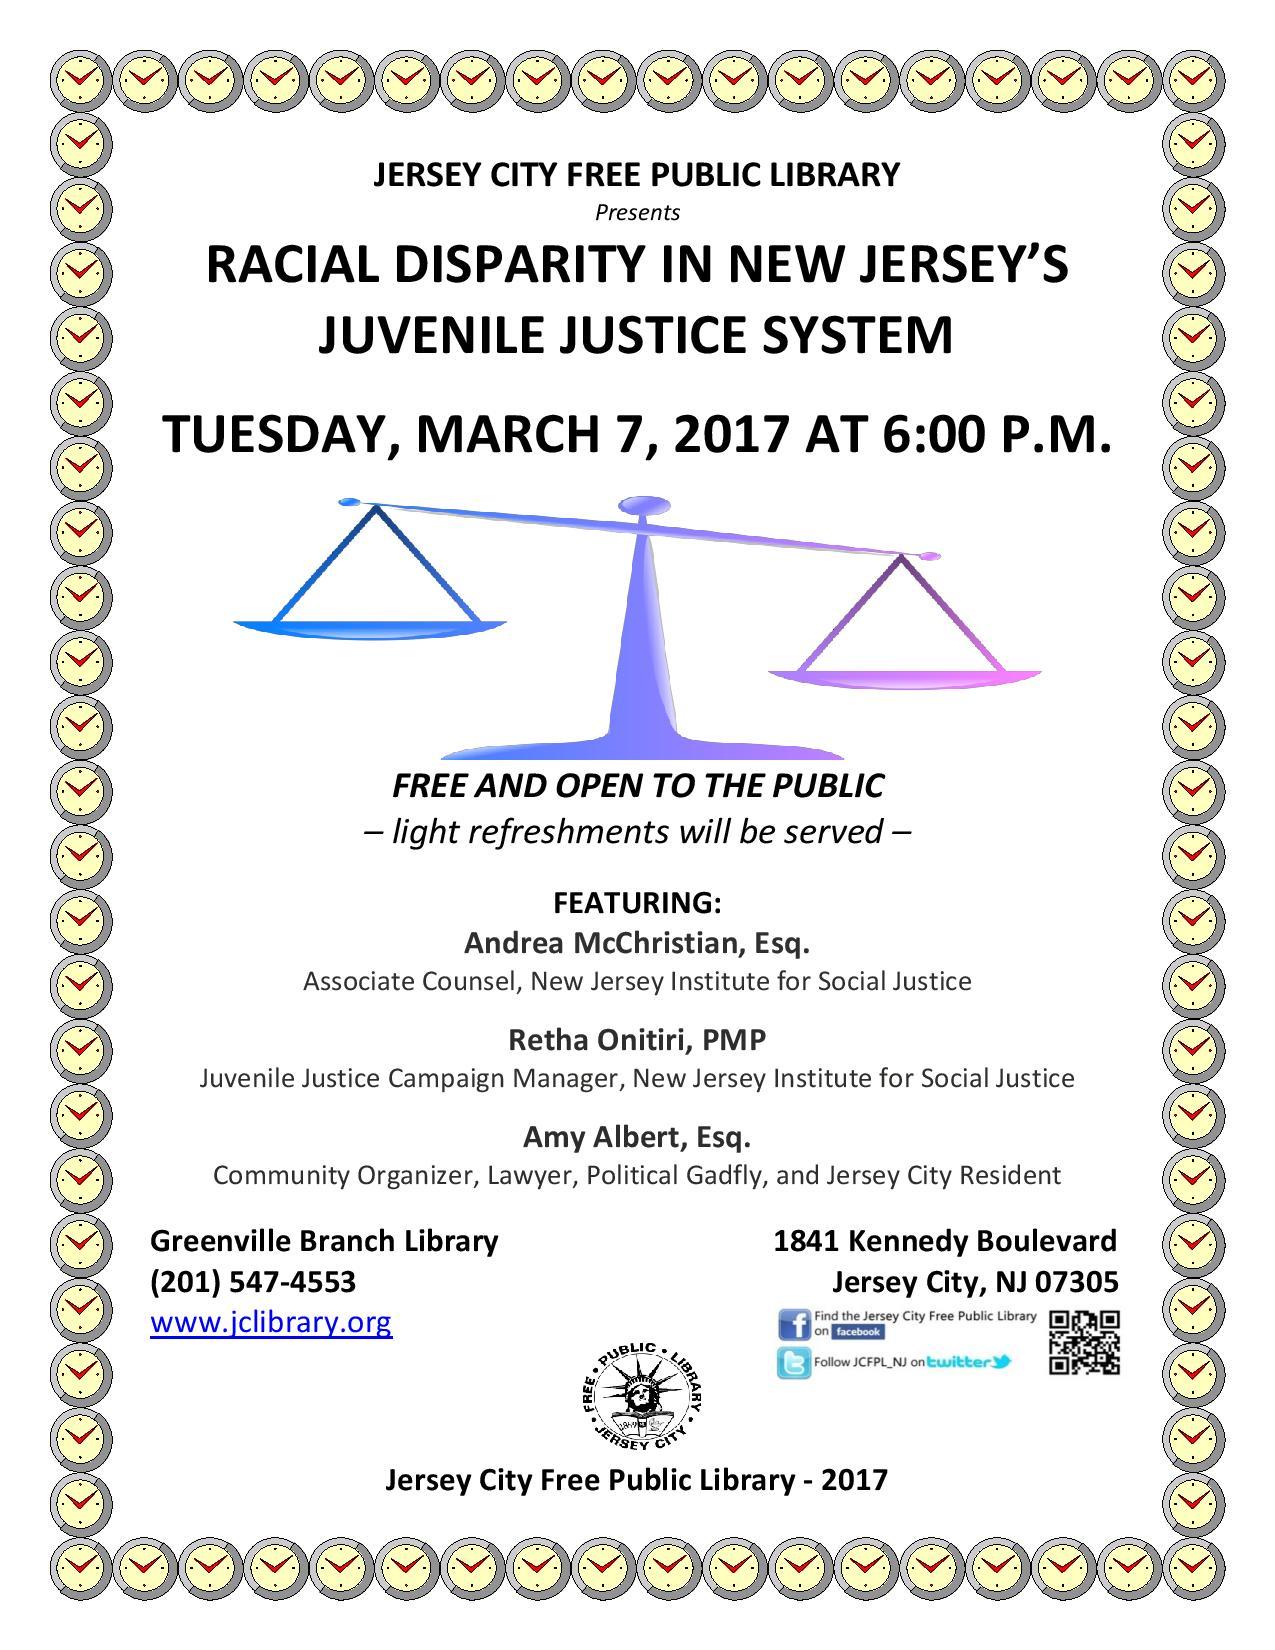 20170307_Greenville_Racial_Disparity_(002)-page-001.jpg